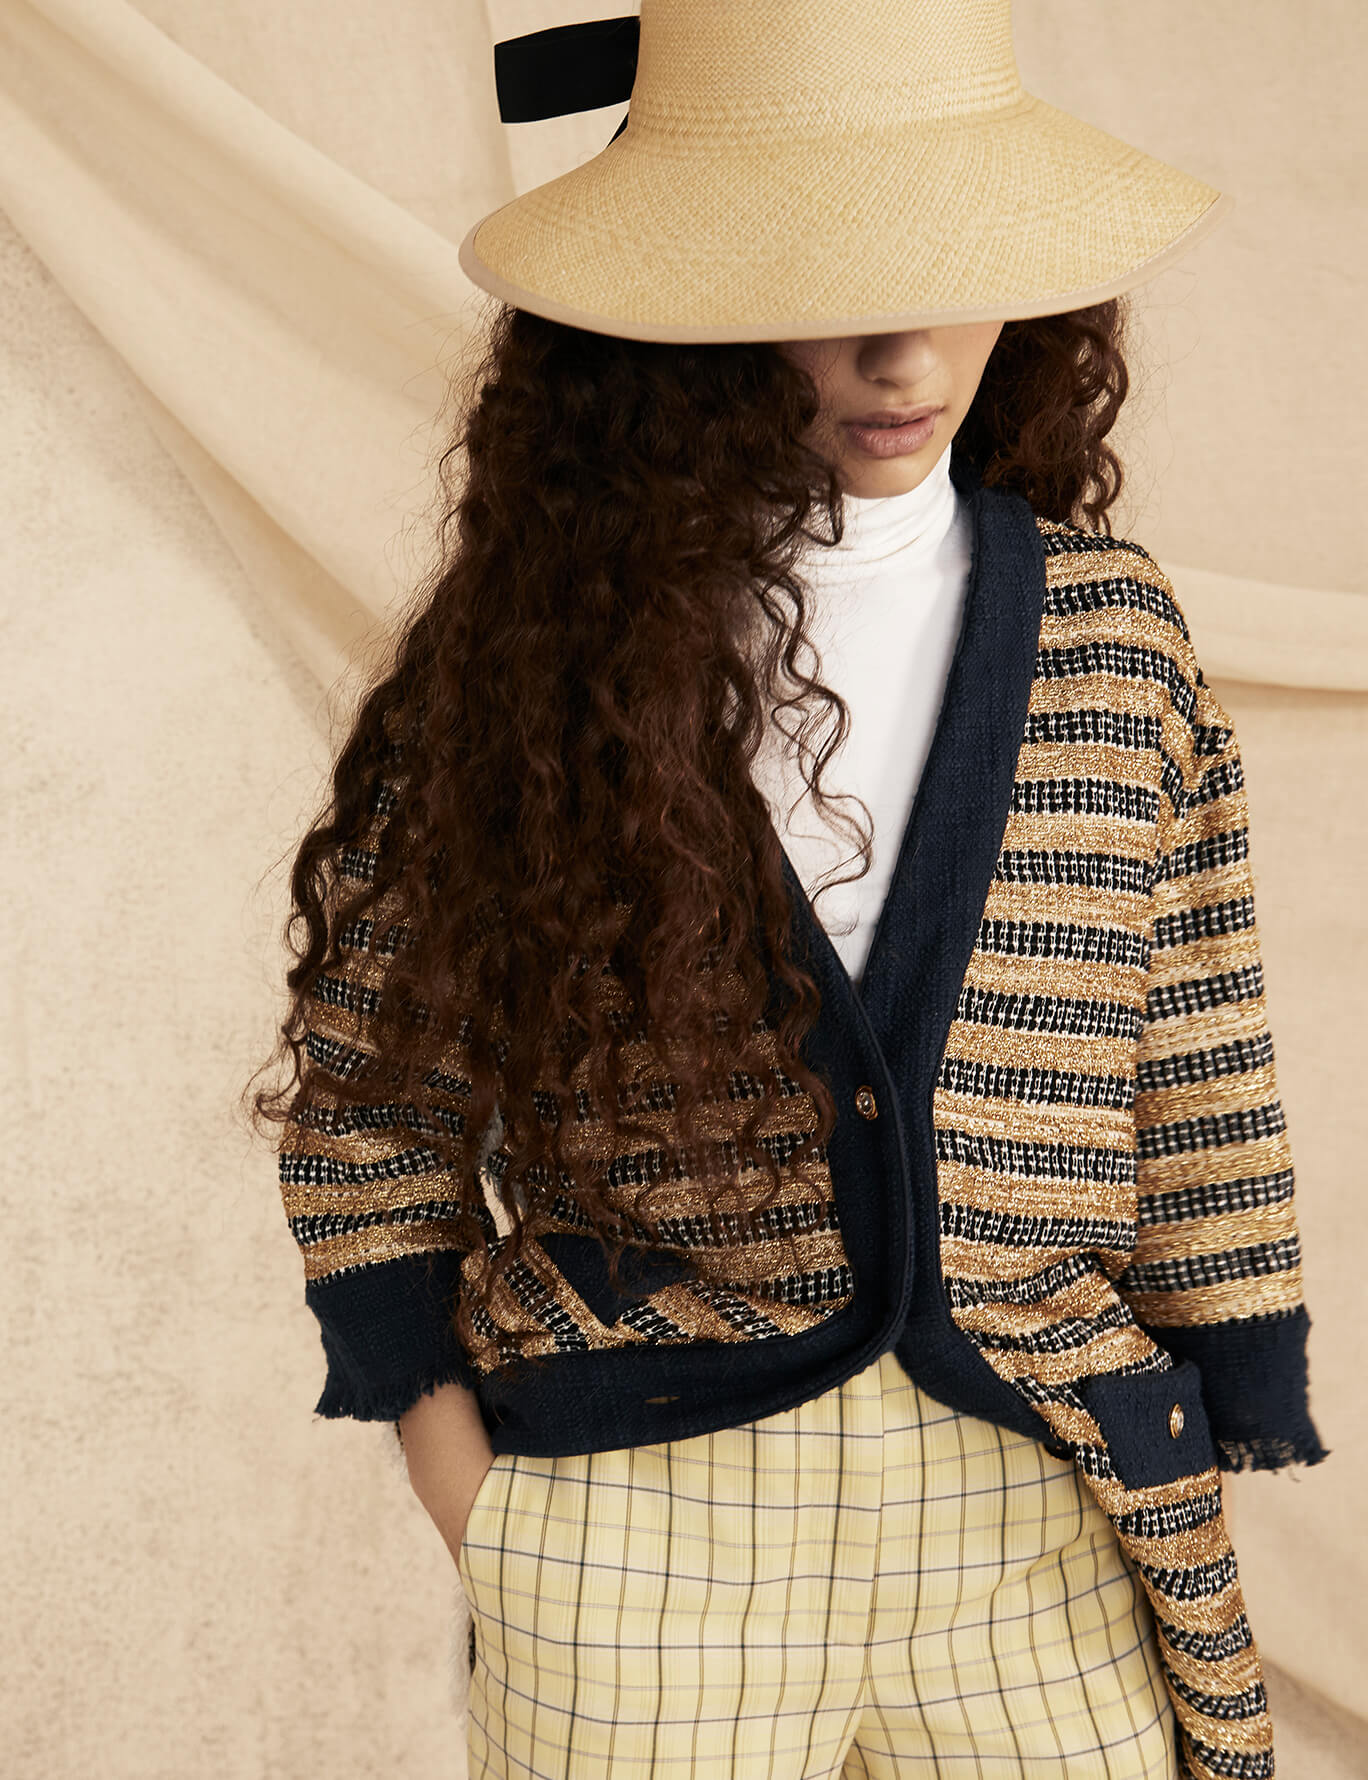 the-modist-fashion-shoot-1.jpg